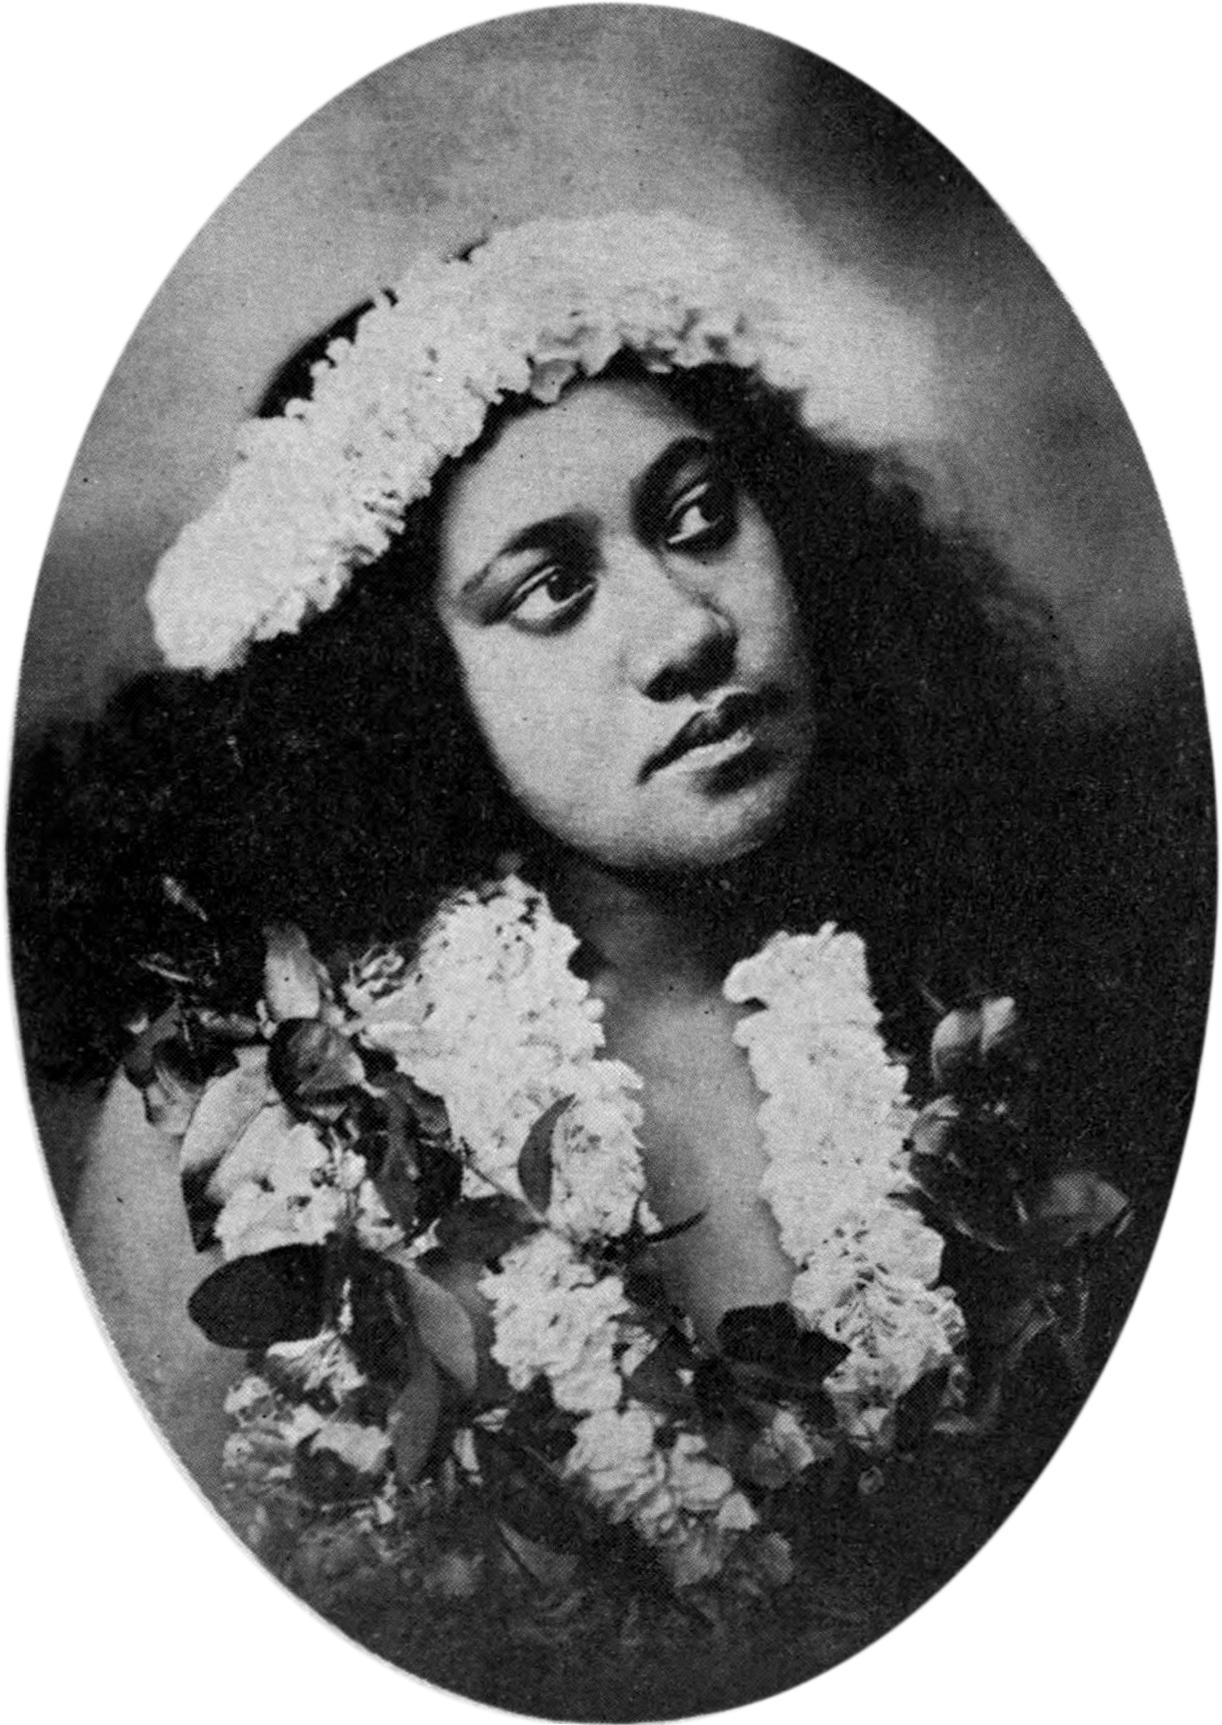 FileTypical Hawaiian Girl C 1911jpg Wikimedia Commons